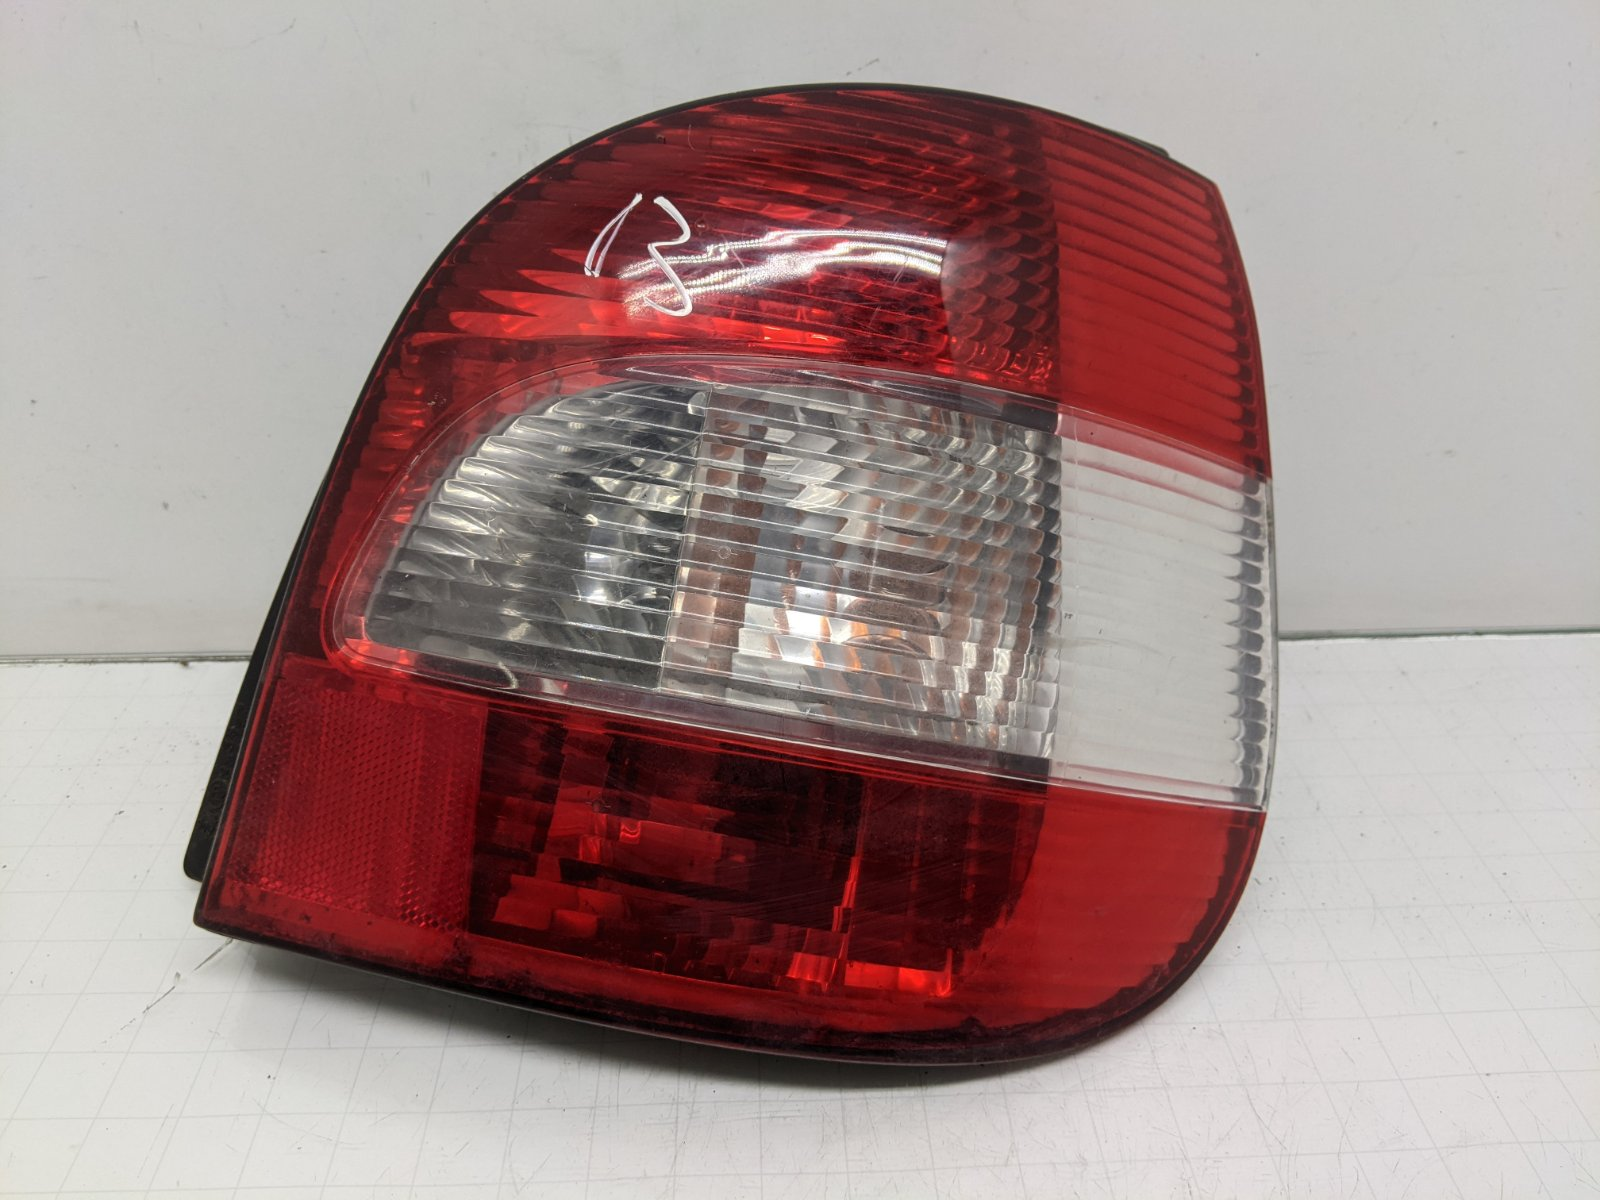 Фонарь задний правый Renault Scenic 1.4 I 2003 (б/у)